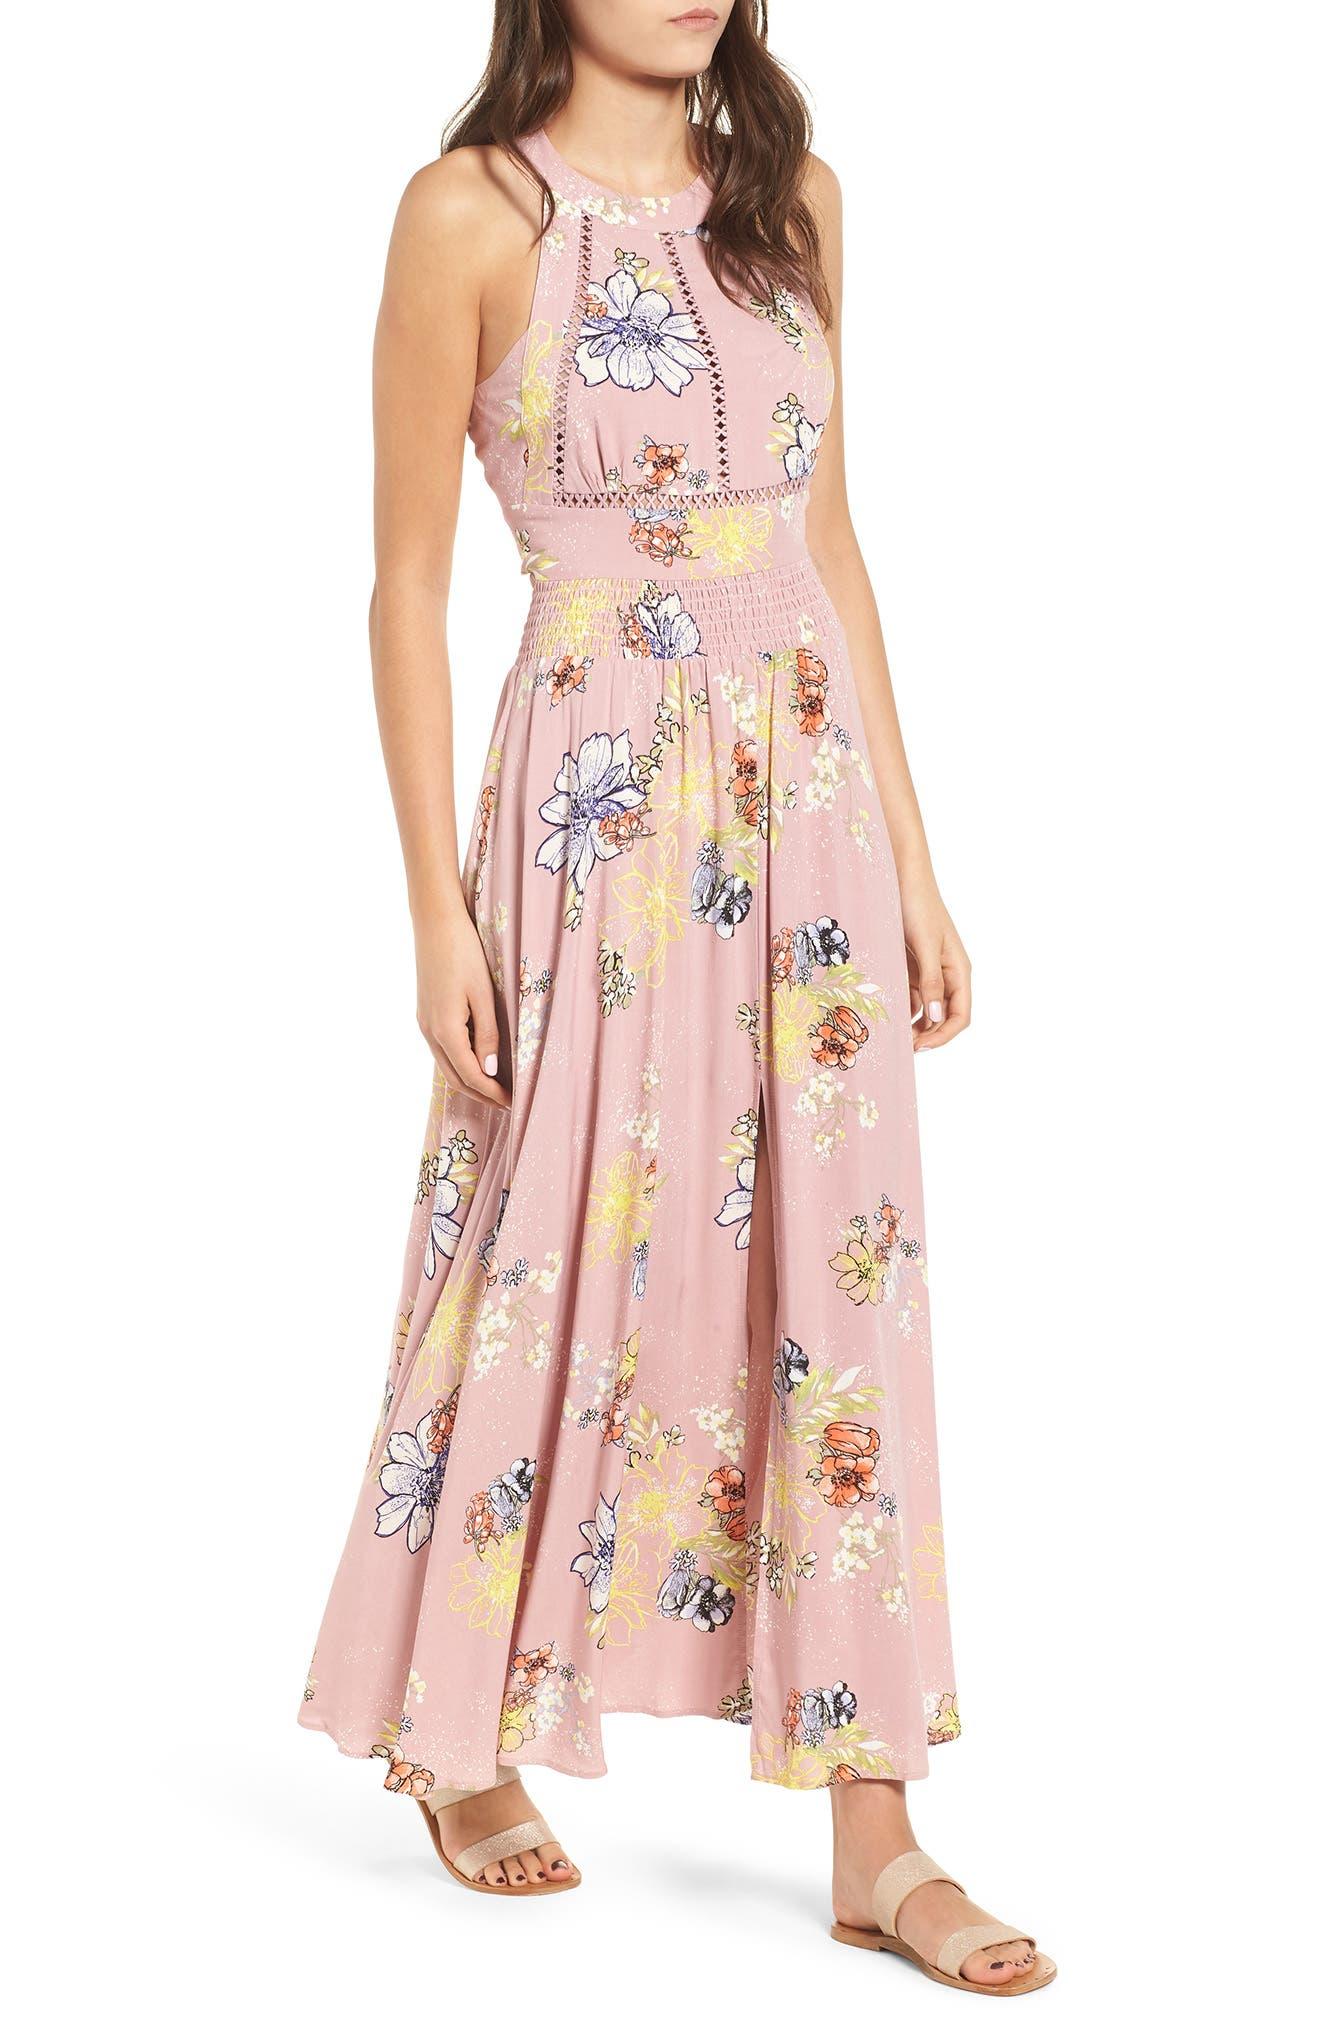 Floral Print Halter Maxi Dress,                         Main,                         color, PINK EGRET ABSTRACT FLORAL